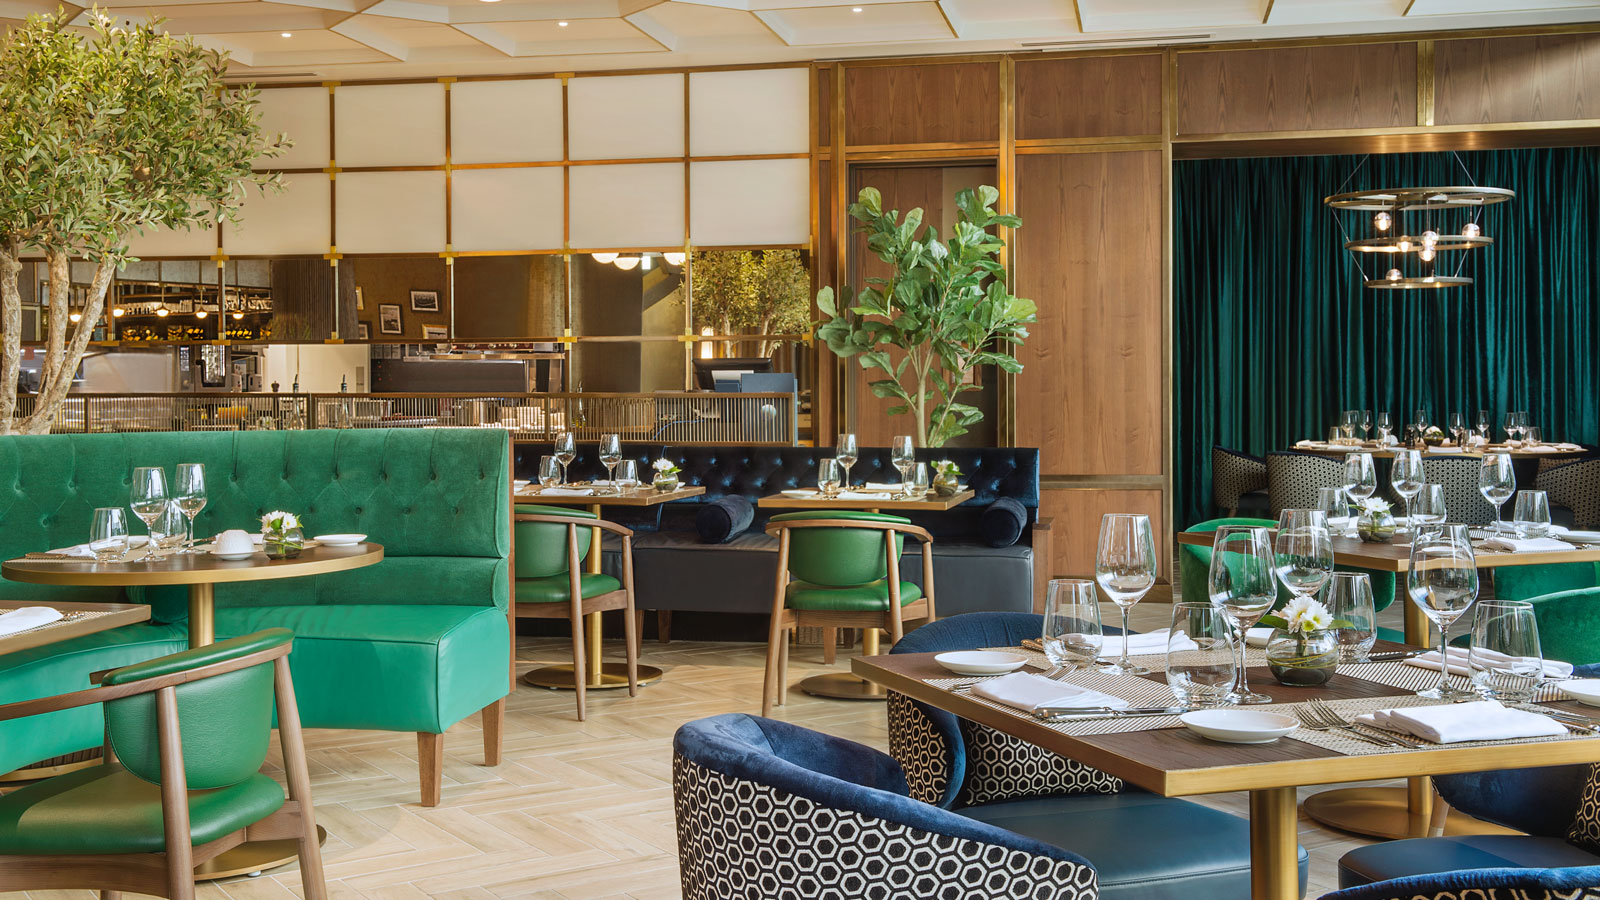 14 Hot New Restaurants Around The World